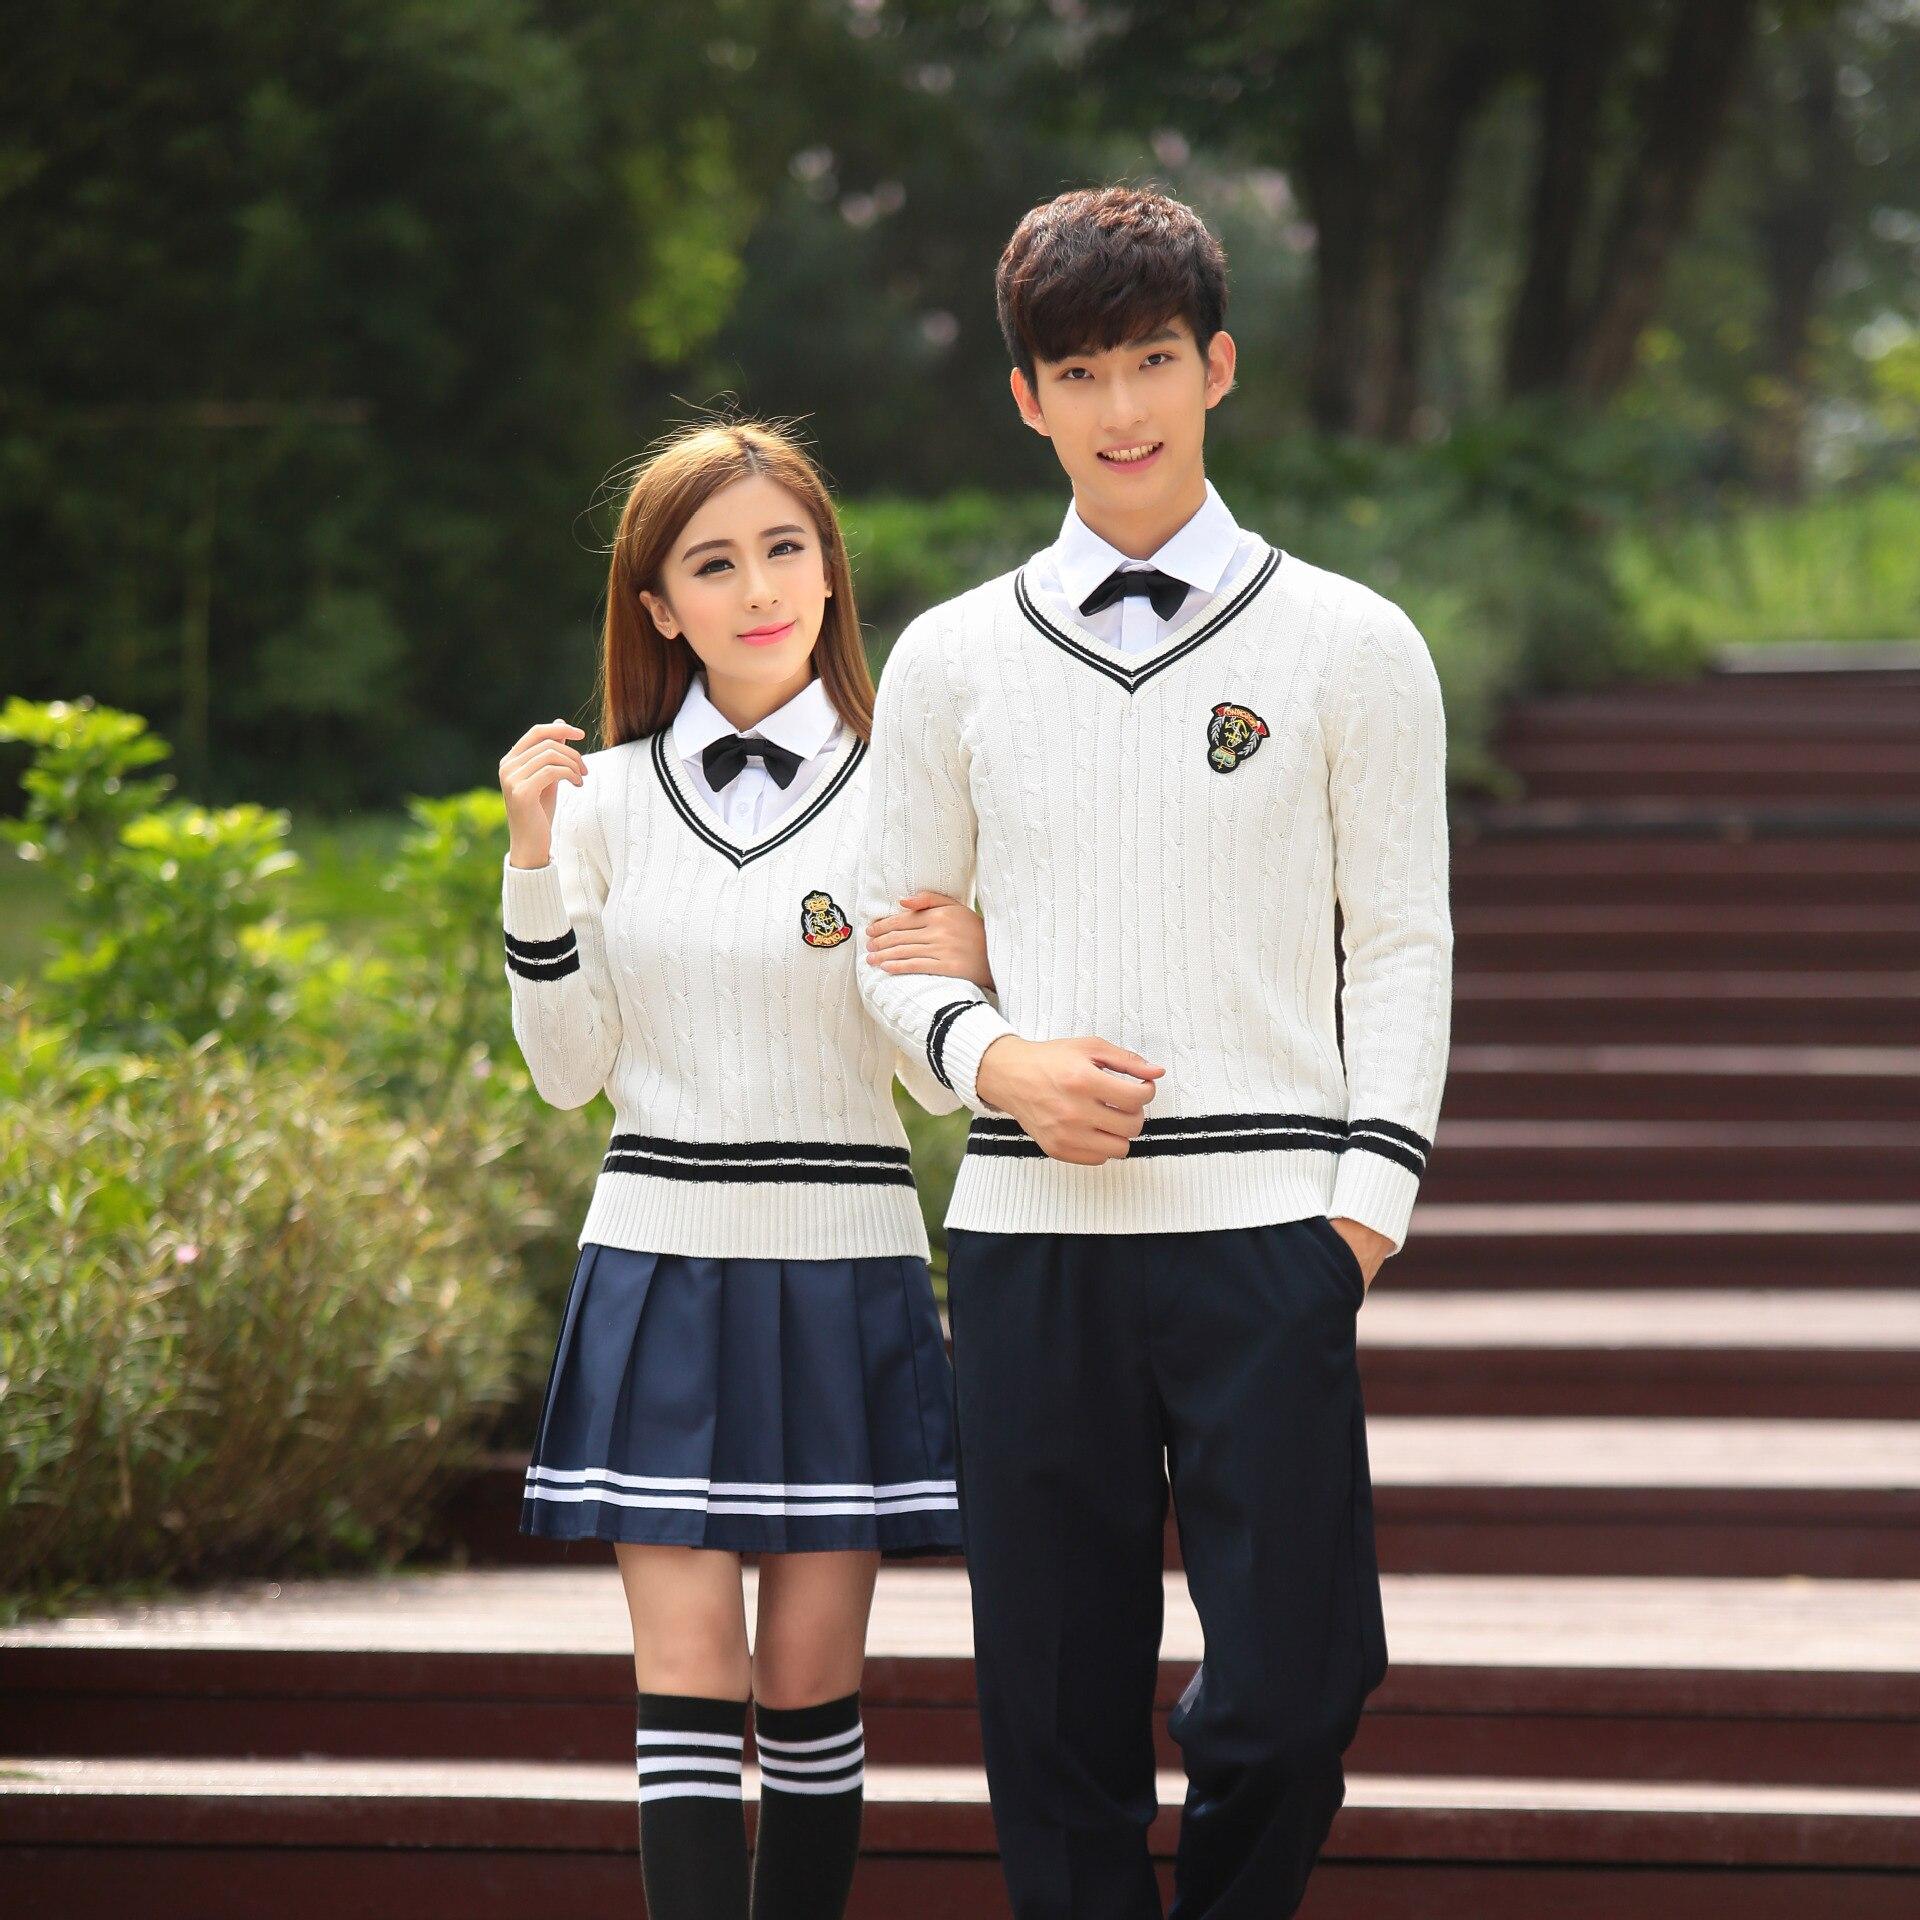 Korea Institute Of Wind Uniforms Middle School Boys And Girls Kaos Pria Lengan Pendek Cabanna Black Floral Shirt Jepang Seragam Sekolah Gadis Kapas Sweater Rok Musim Dingin Siswa Inggris